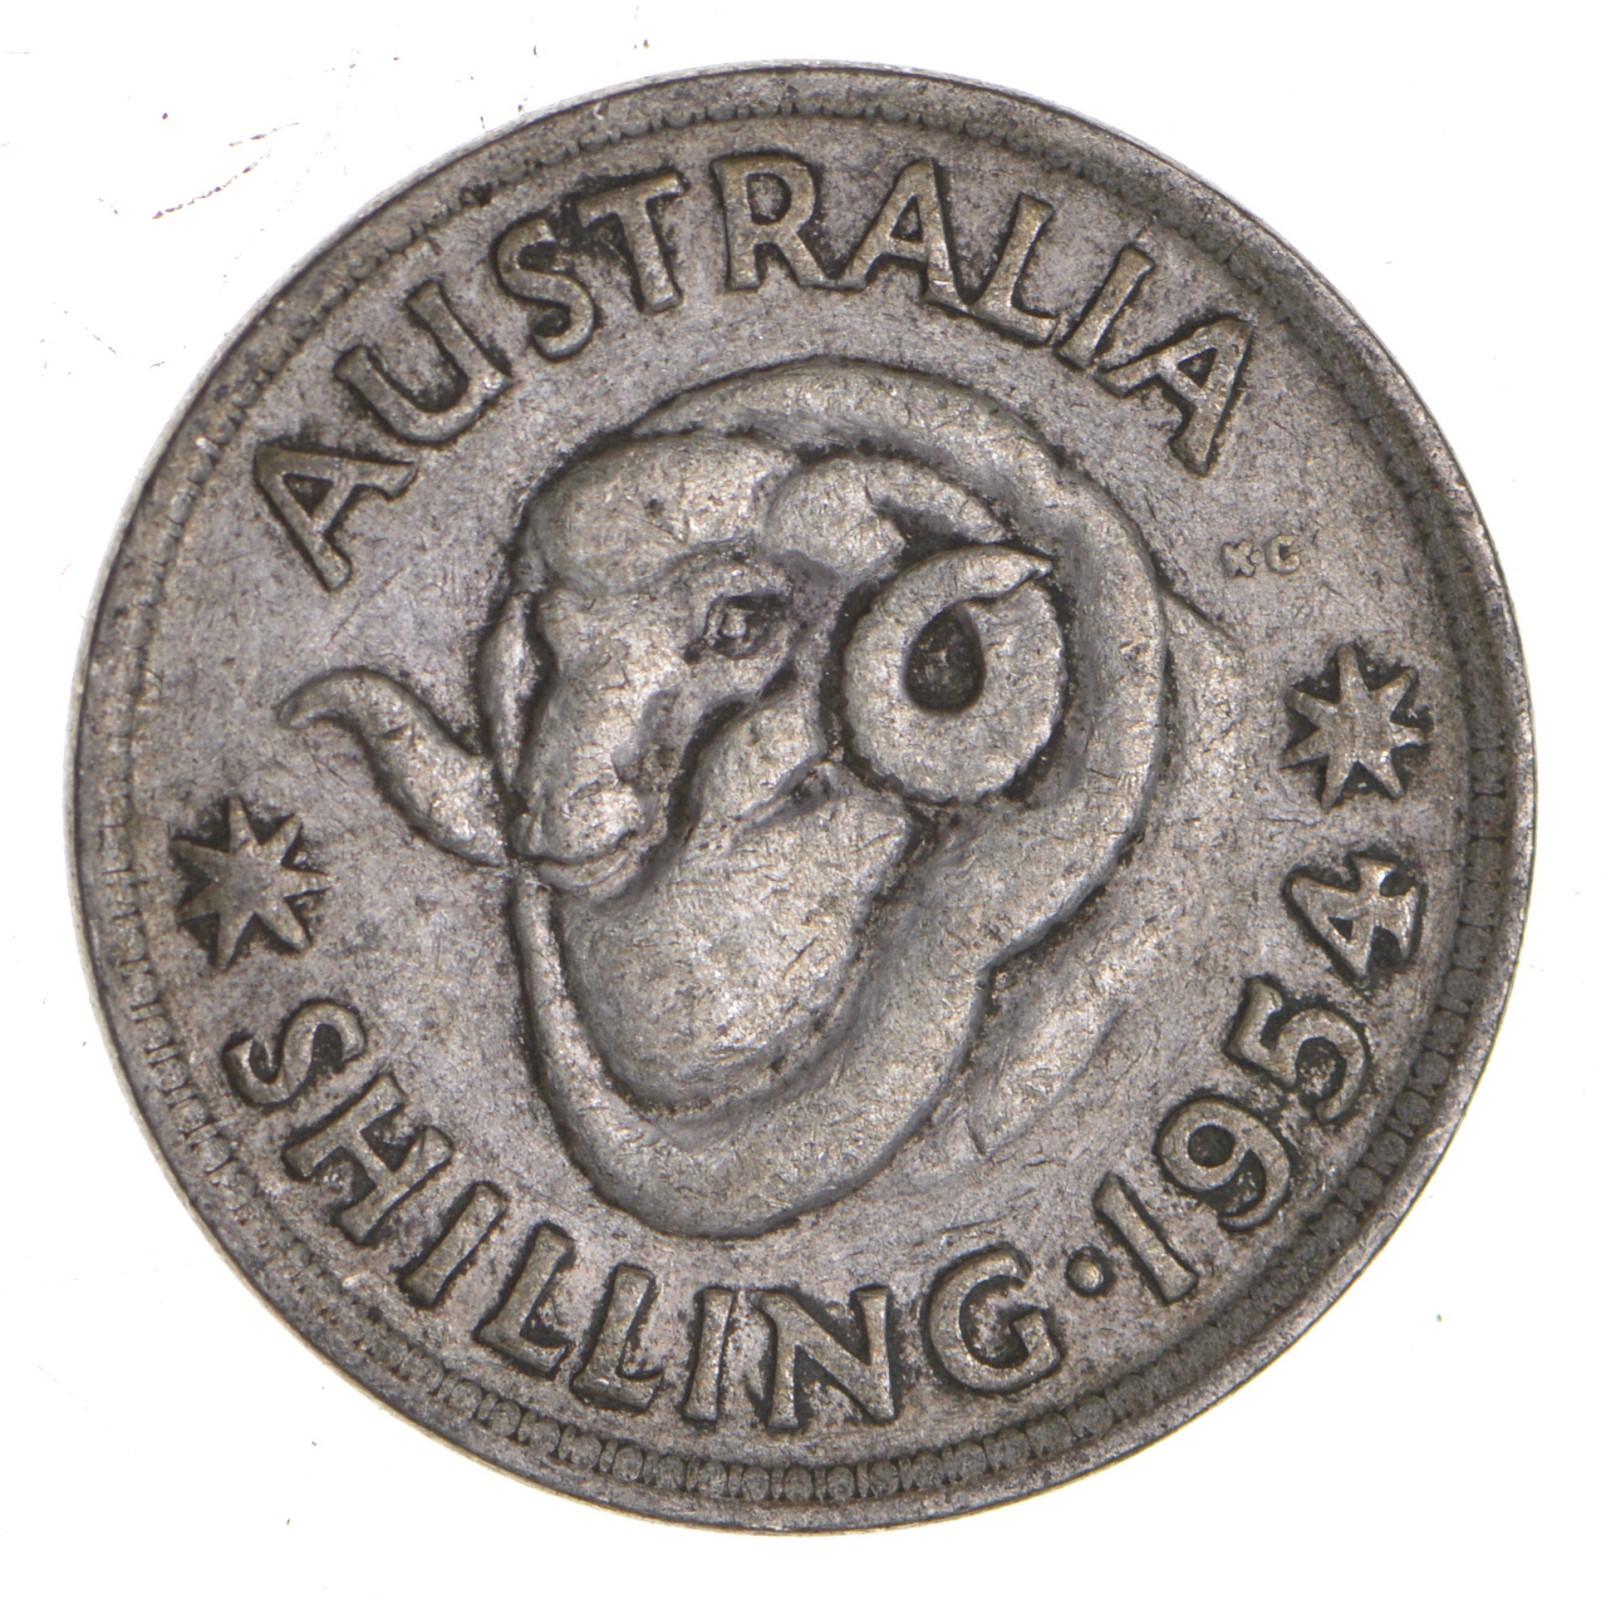 1954 Canada Nickel Graded as Brilliant Uncirculated From Original Roll